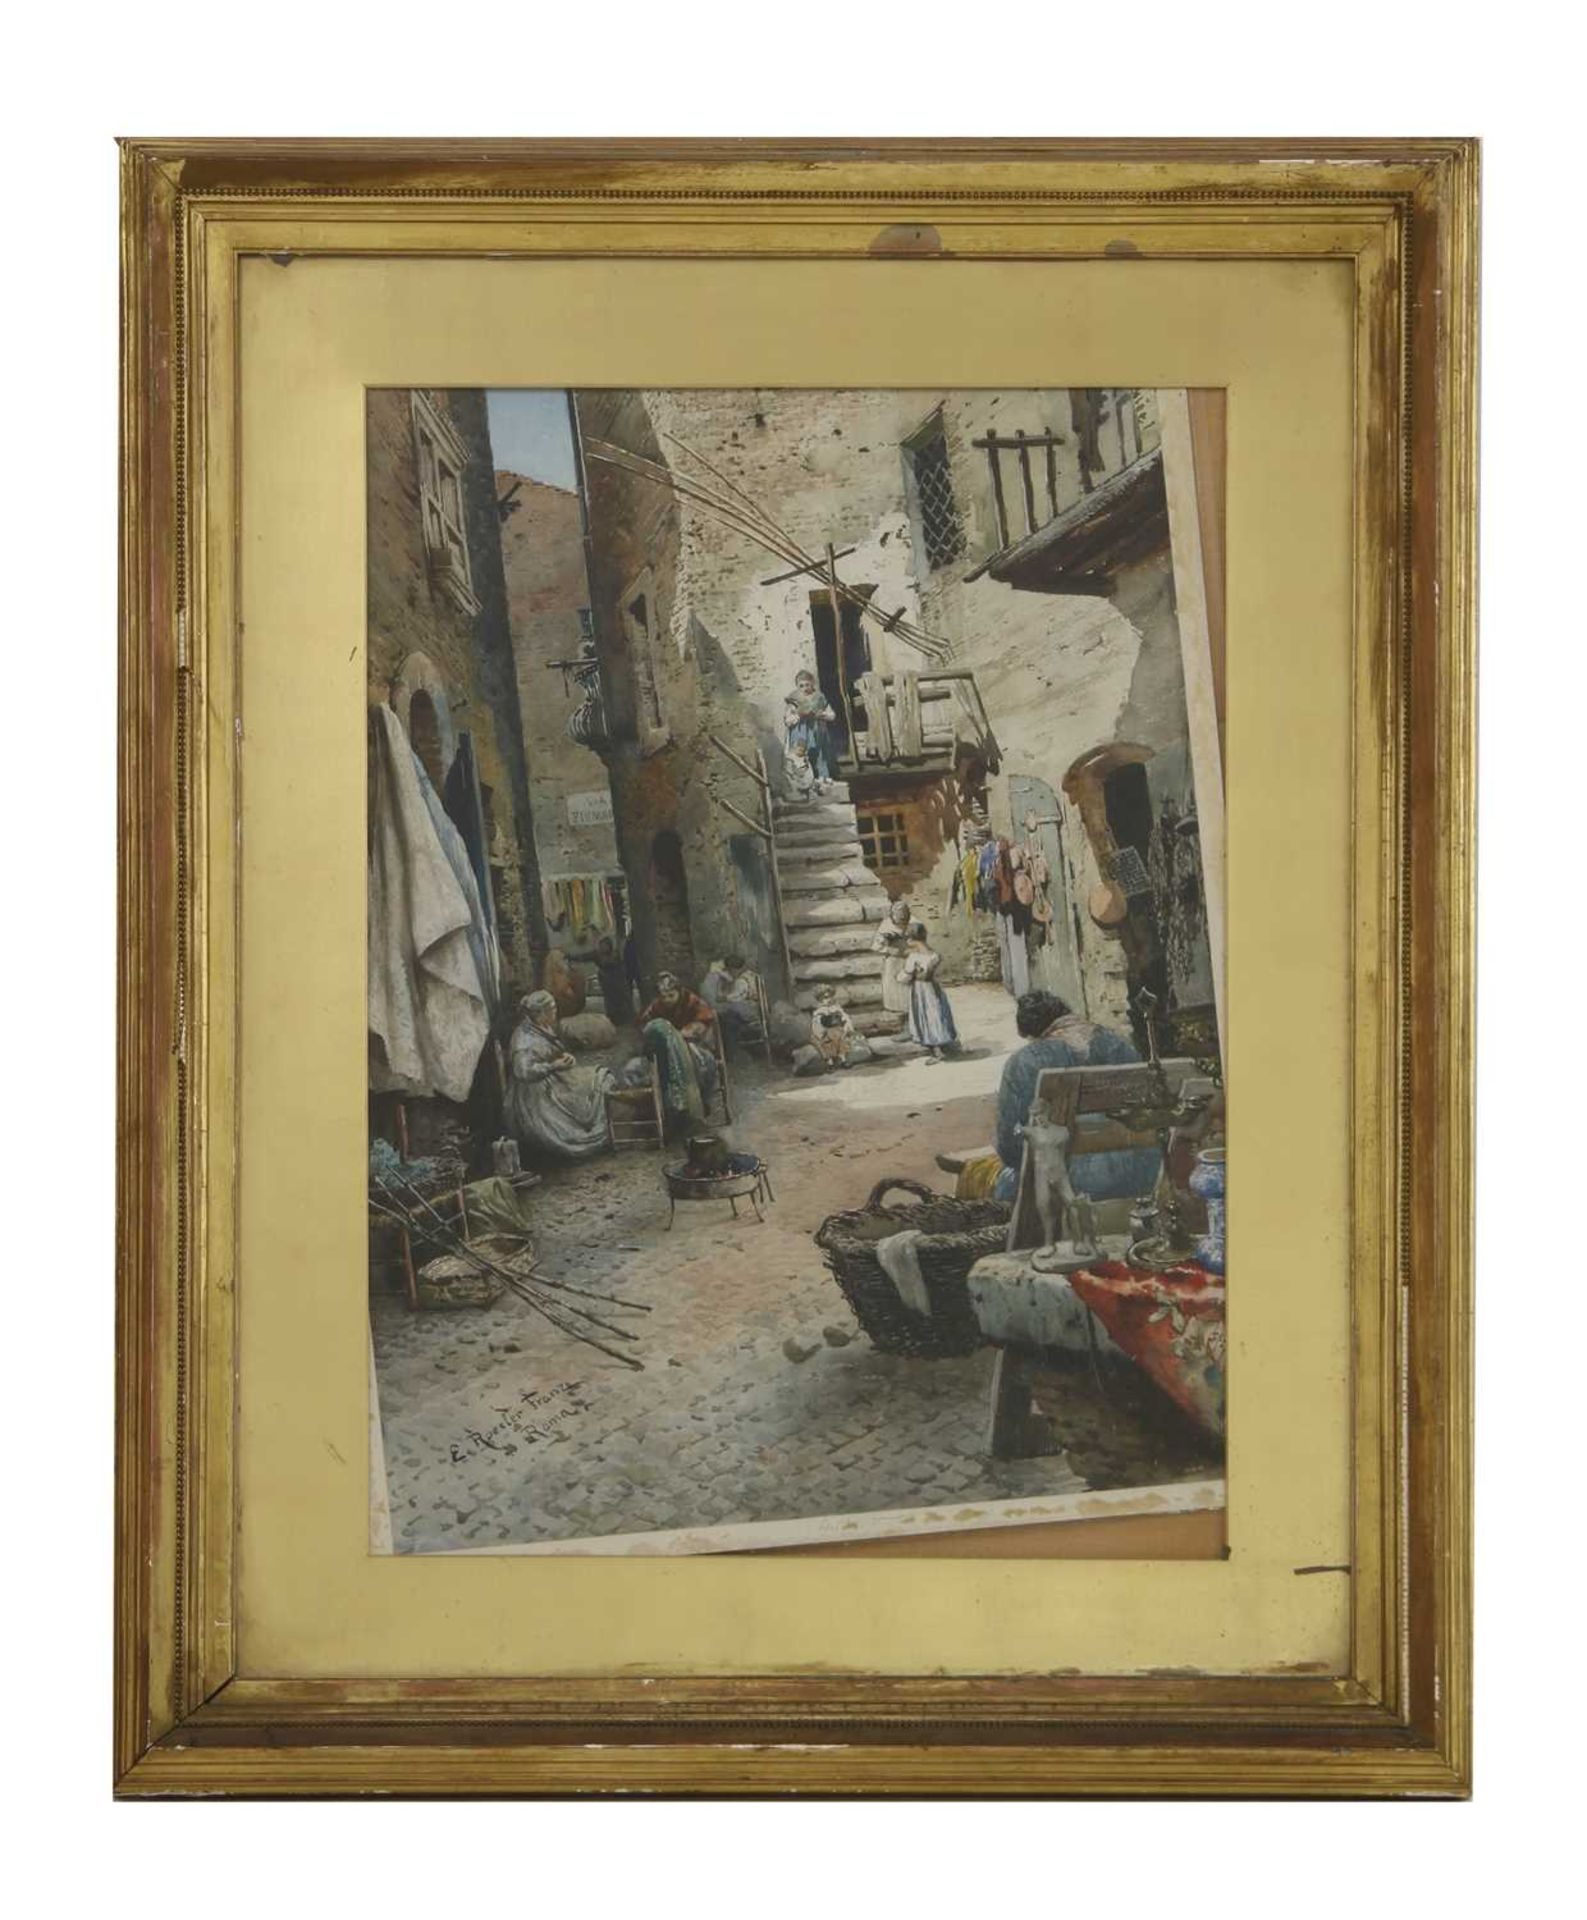 Ettore Roesler Franz (Italian, 1845-1907) - Image 4 of 10